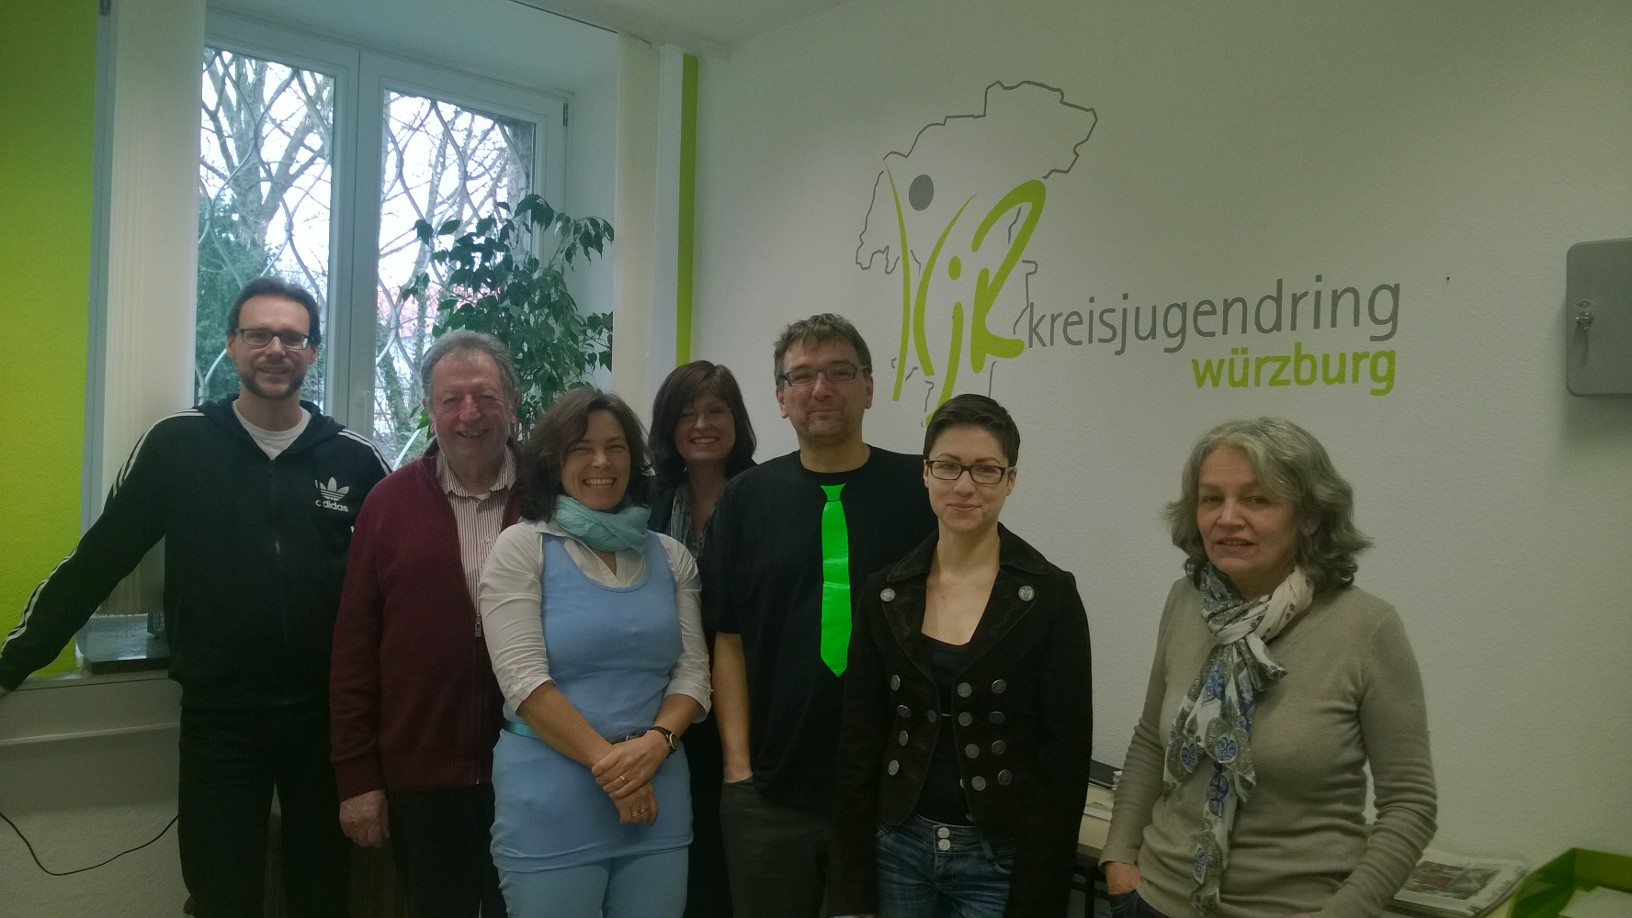 Treffen beim Kreisjugendring, v.l.n.r.: Sven Winzenhörlein, Fred Stahl, Kerstin Celina, Karen Heußner, Carsten Hackel vom KJR, Eva Pumpurs, Rita Heeg.